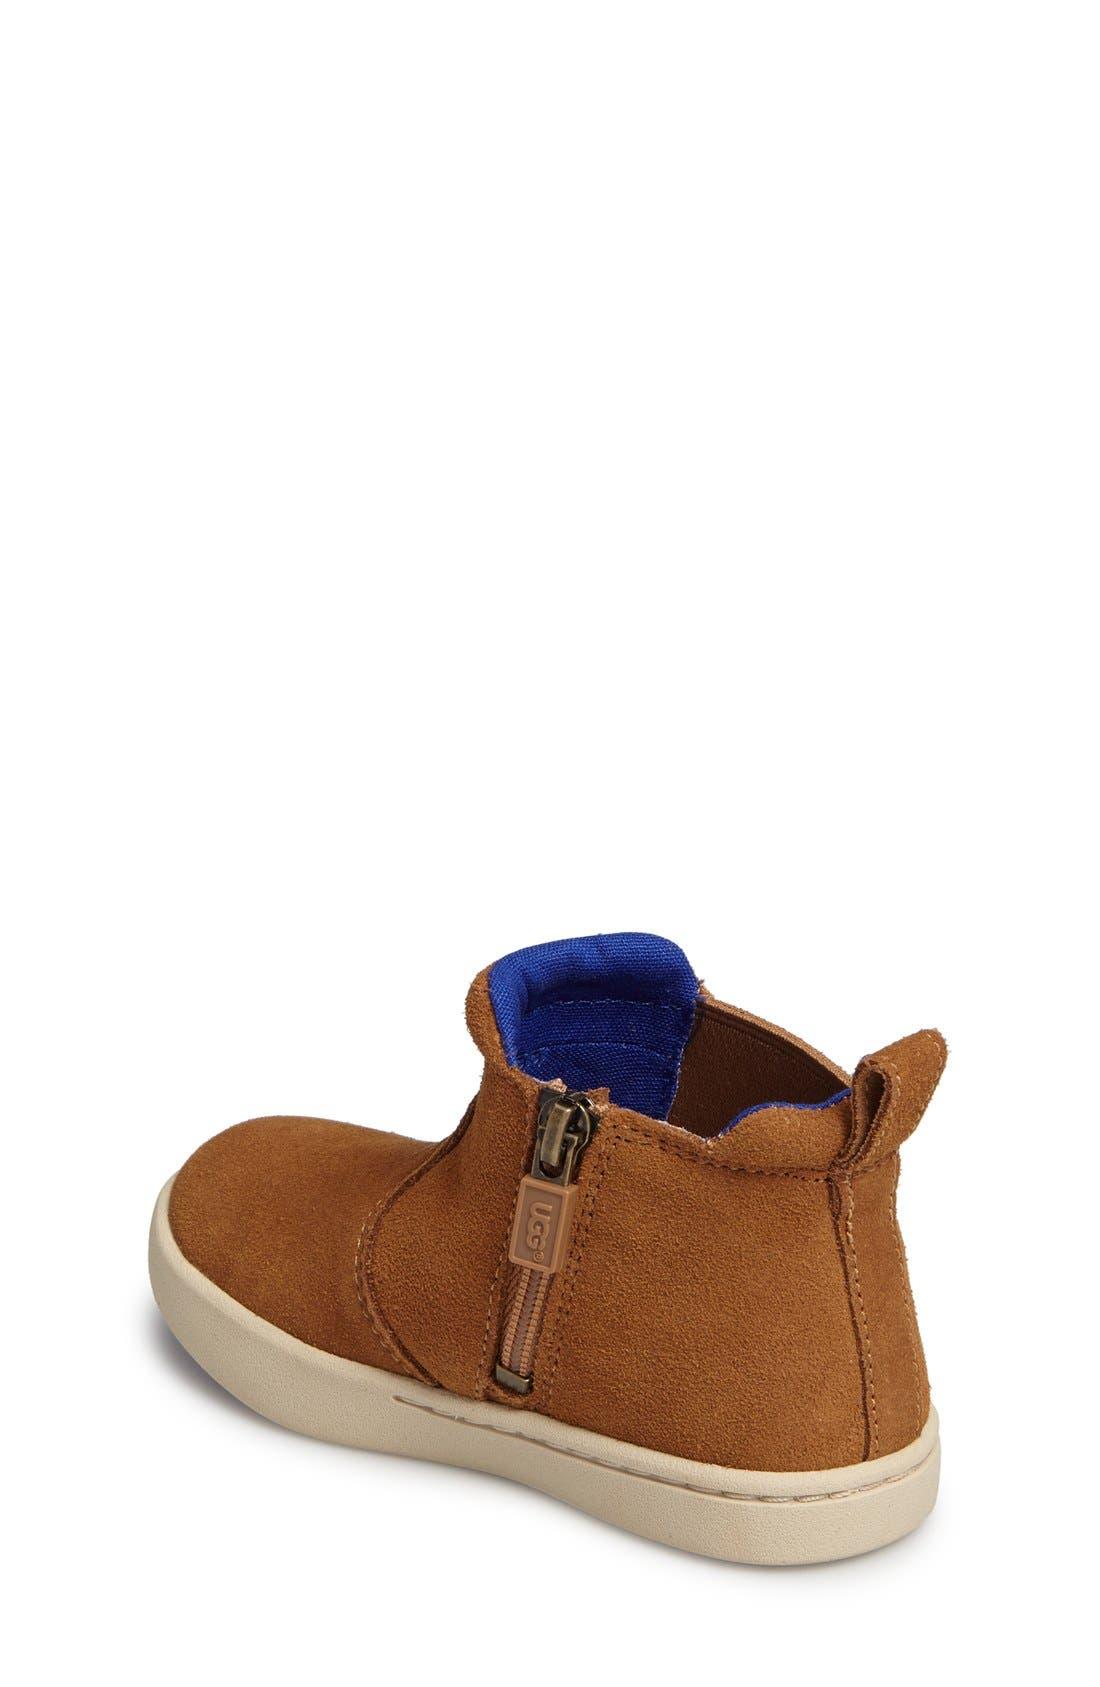 Alternate Image 2  - UGG® Hamden Sneaker (Walker, Toddler, Little Kid & Big Kid)